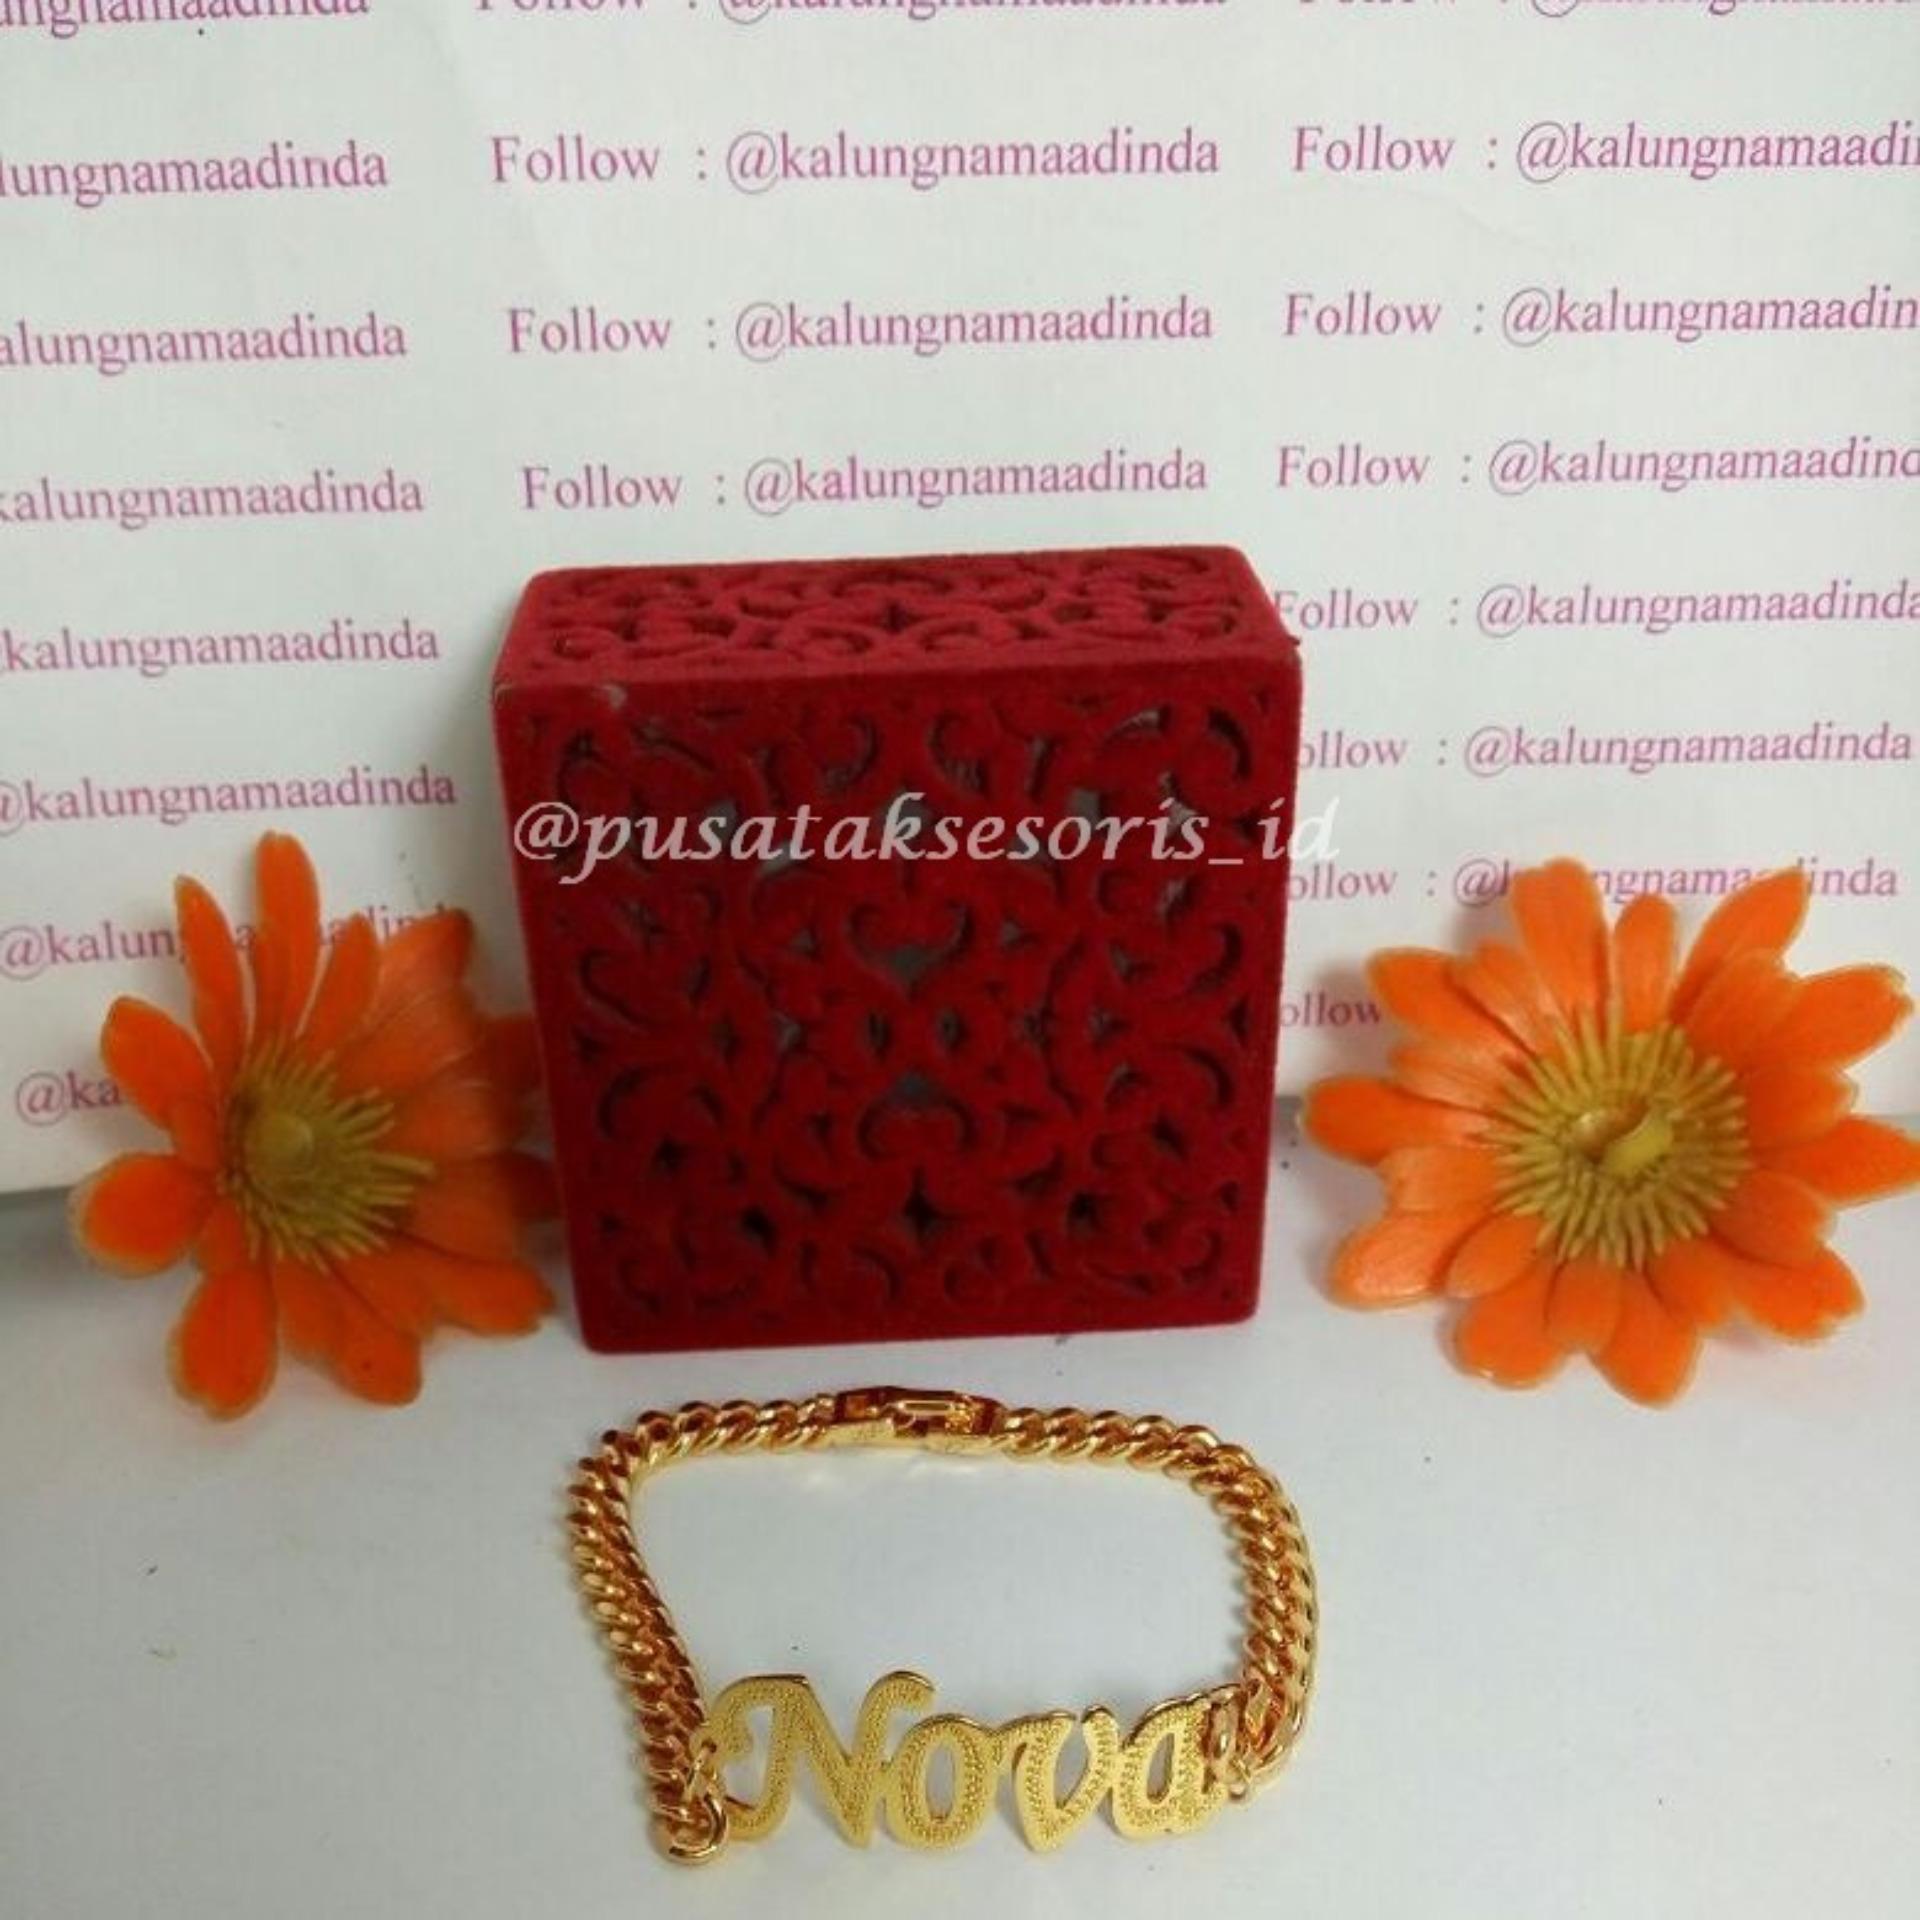 Jual Gelang Nama Gold Lapis Emas 24 Karat Bisa cetak sesuai nama